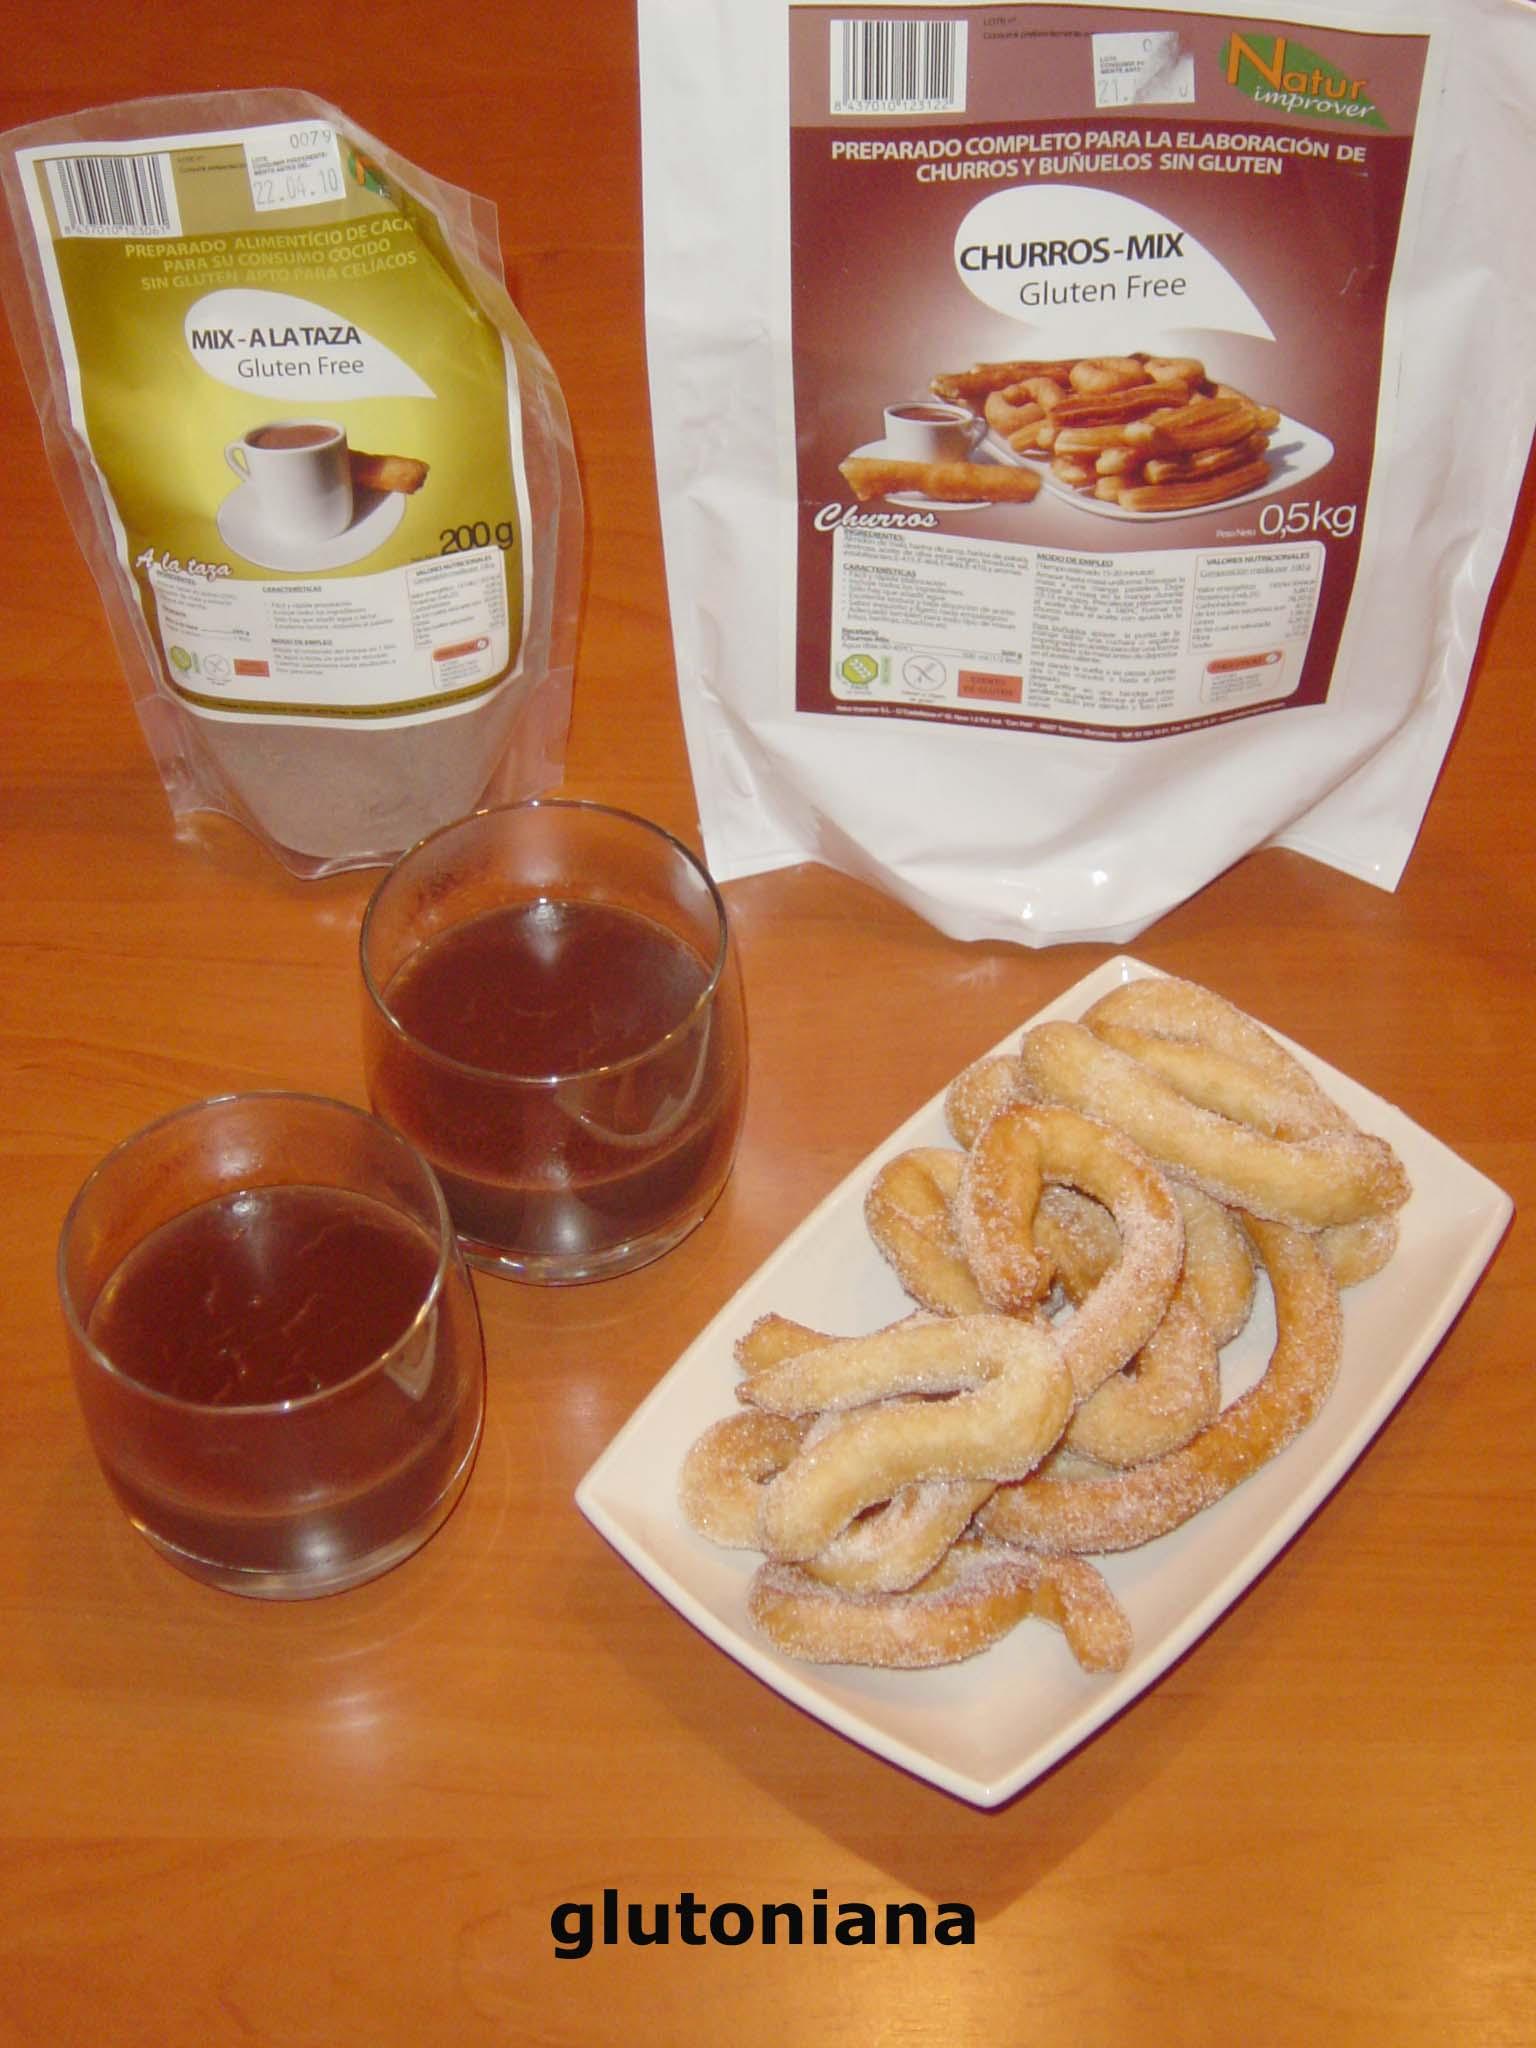 churros chocolate natur improver